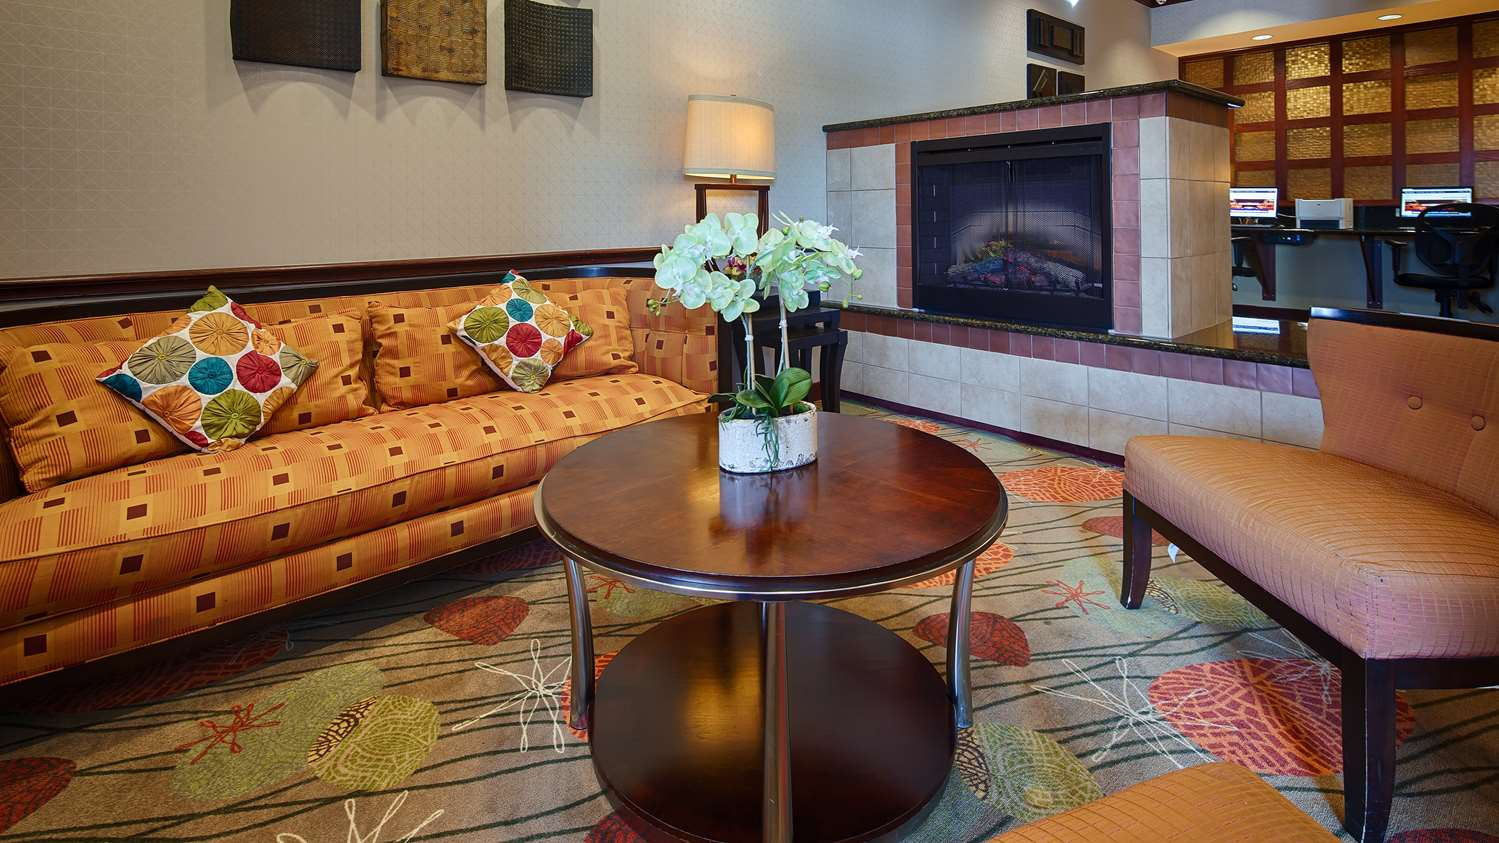 Best Western Plus Duncanville Inn & Suites, TX - See Discounts